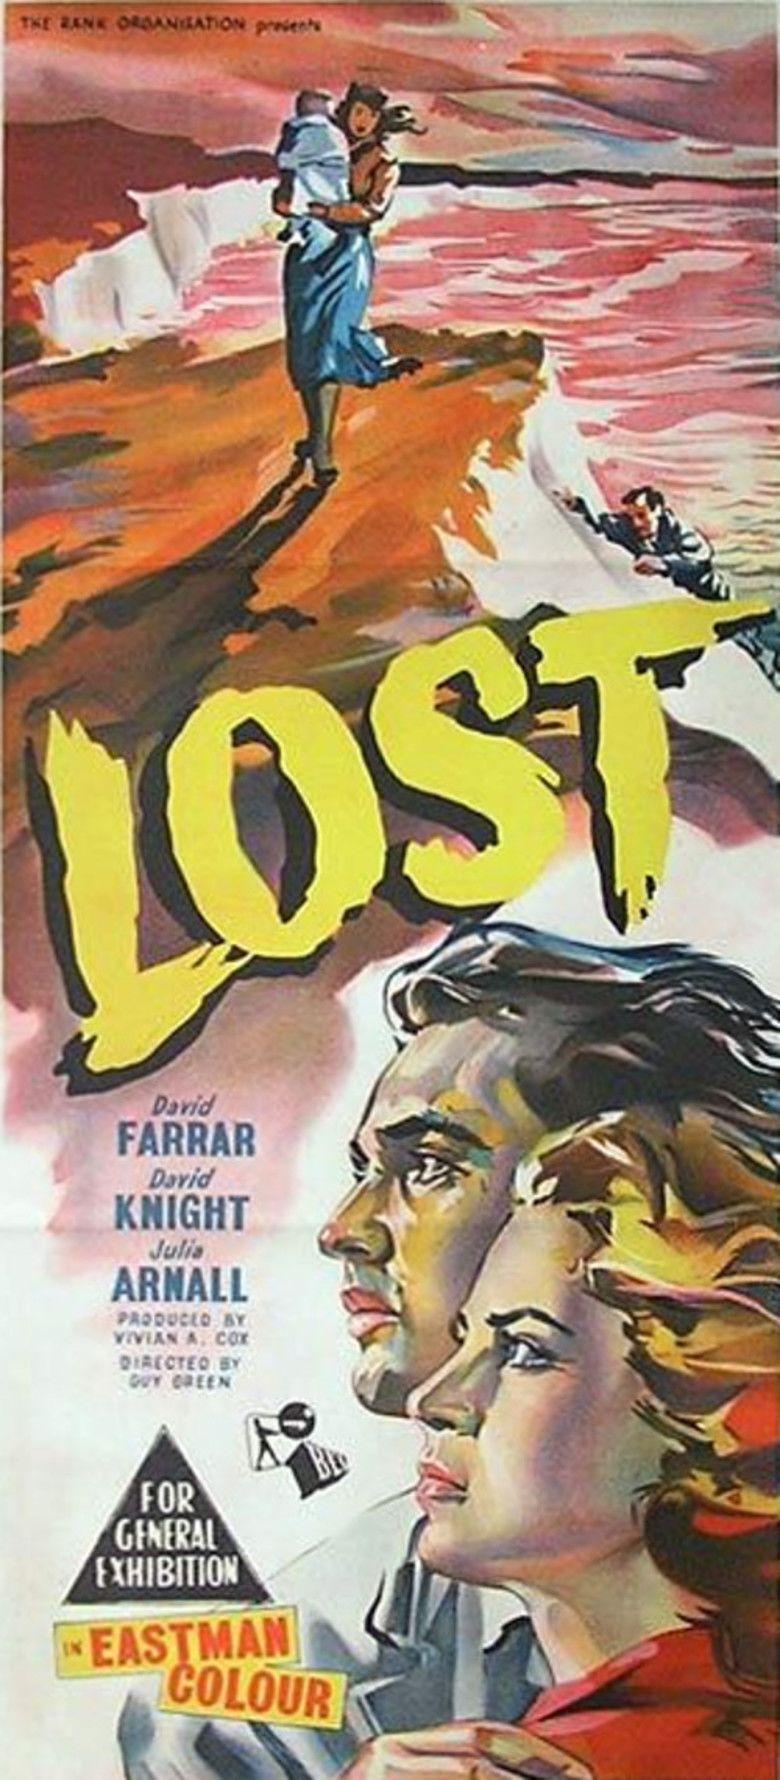 Lost (1956 film) movie poster